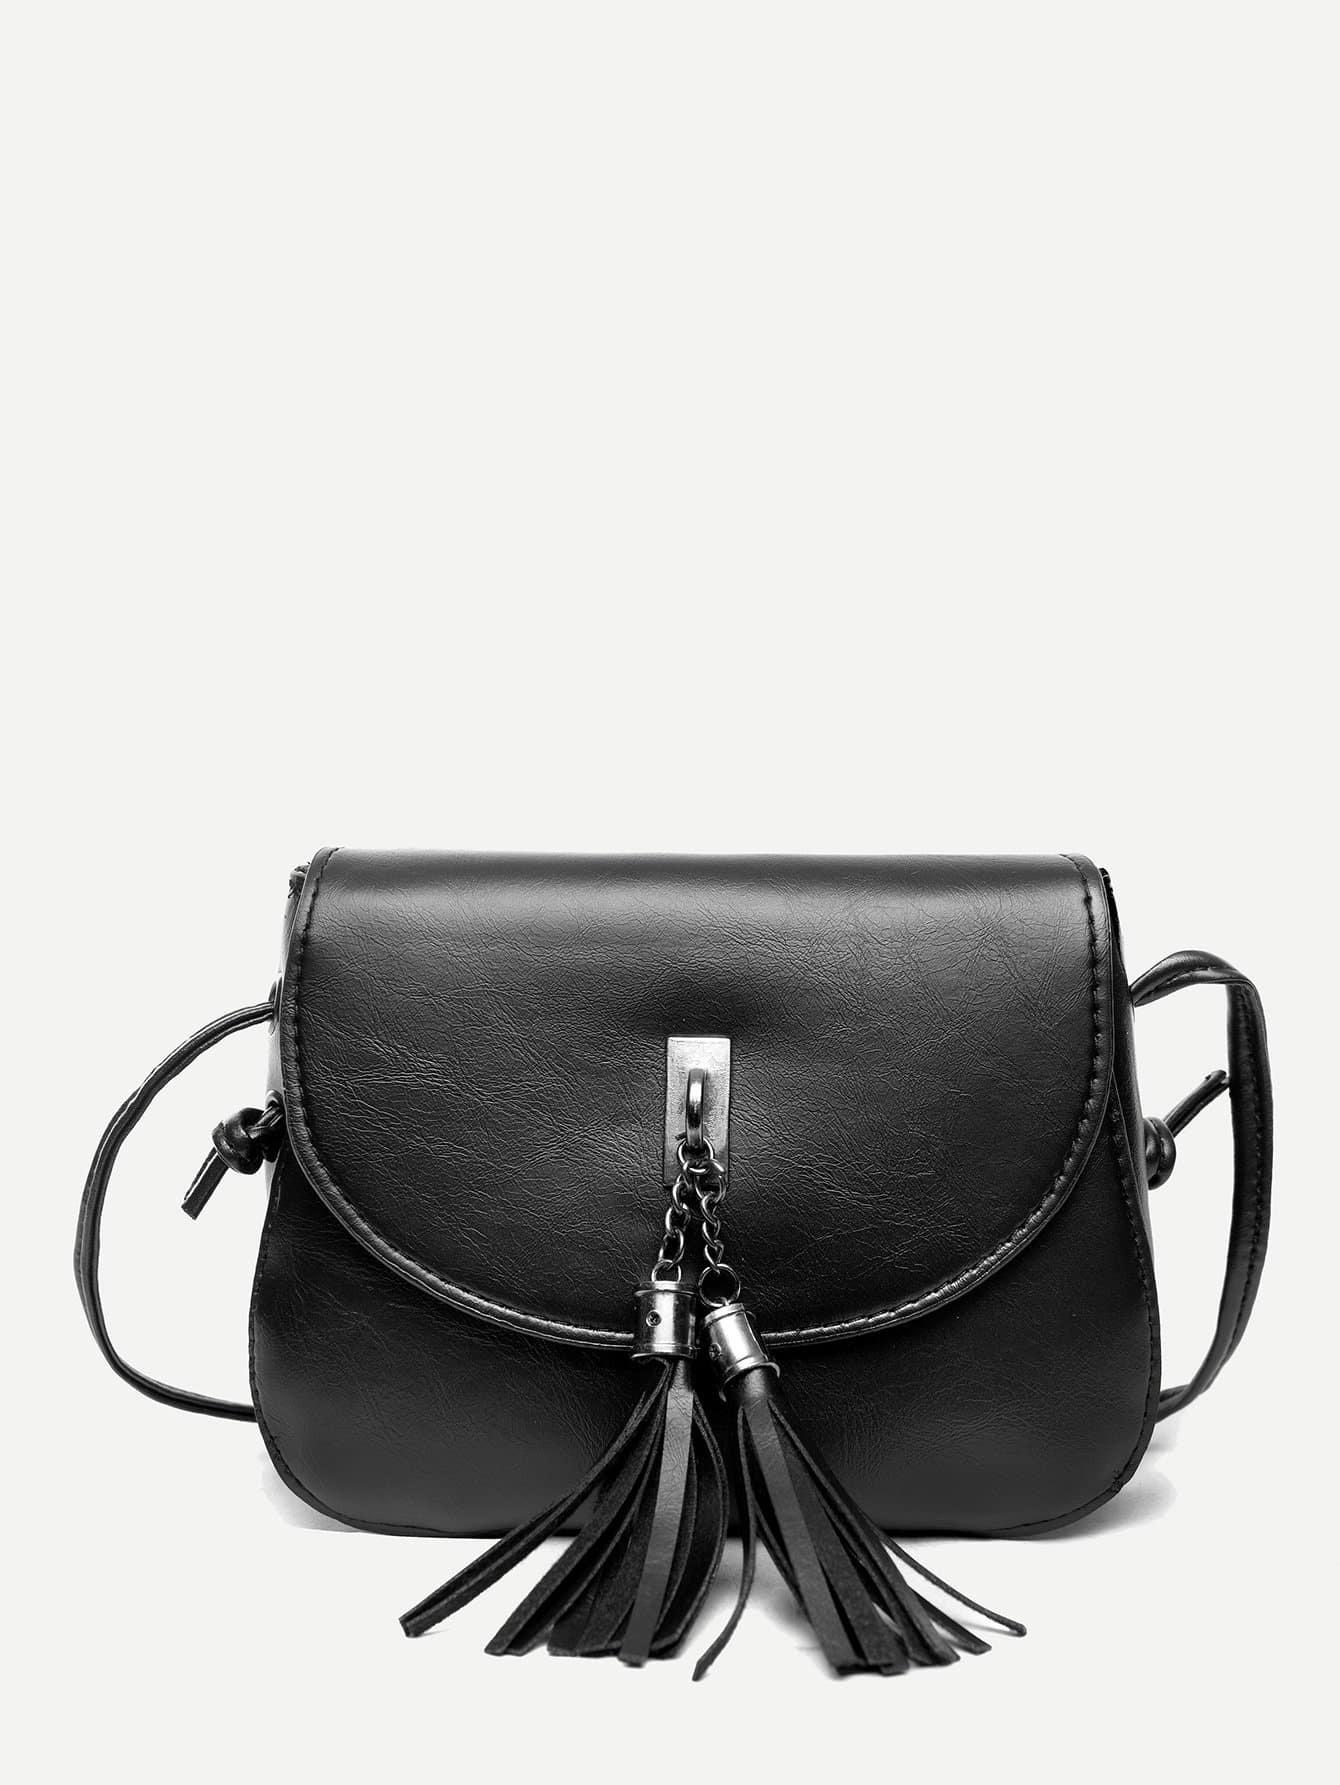 Tassel Decor Flap Saddle Bag sa212 saddle bag motorcycle side bag helmet bag free shippingkorea japan e ems